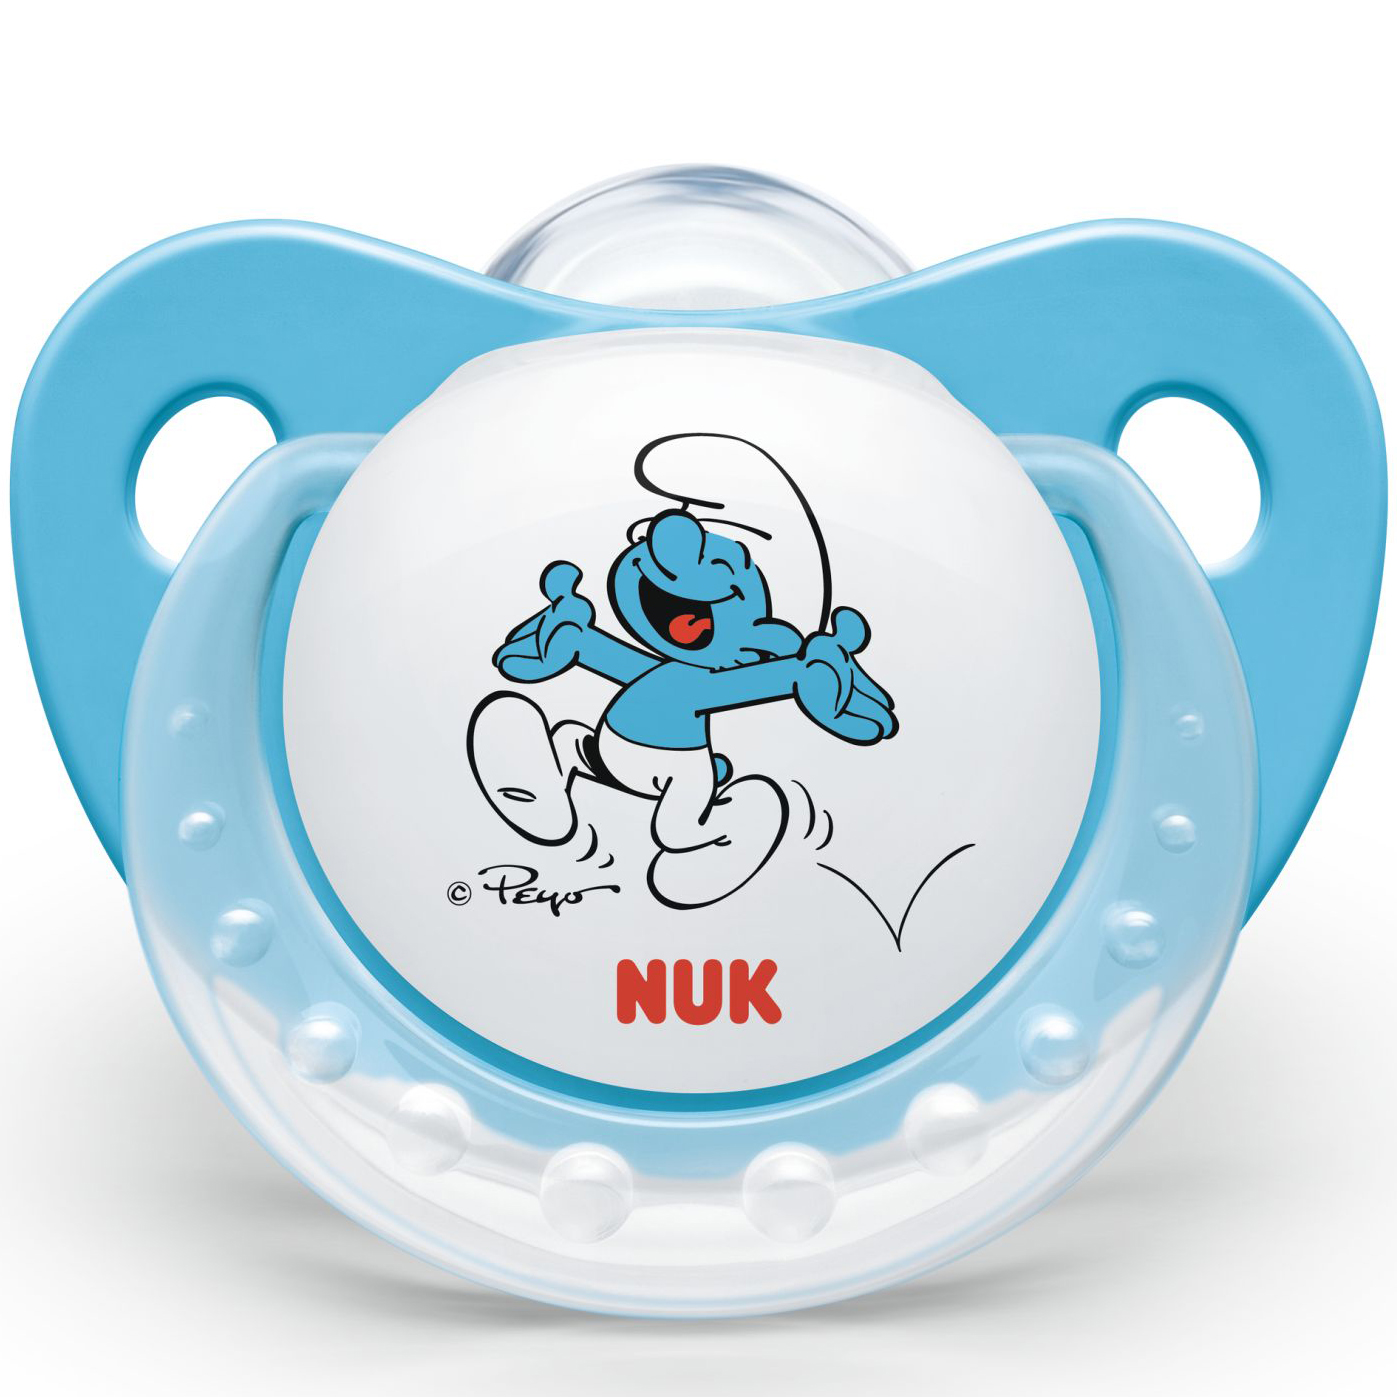 Nuk Trendline The SmurfsΠιπίλα Σιλικόνης με Κρίκο Χωρίς BPA Μπλε Χρώμα – Μέγεθος 2 (6-18 μηνών)